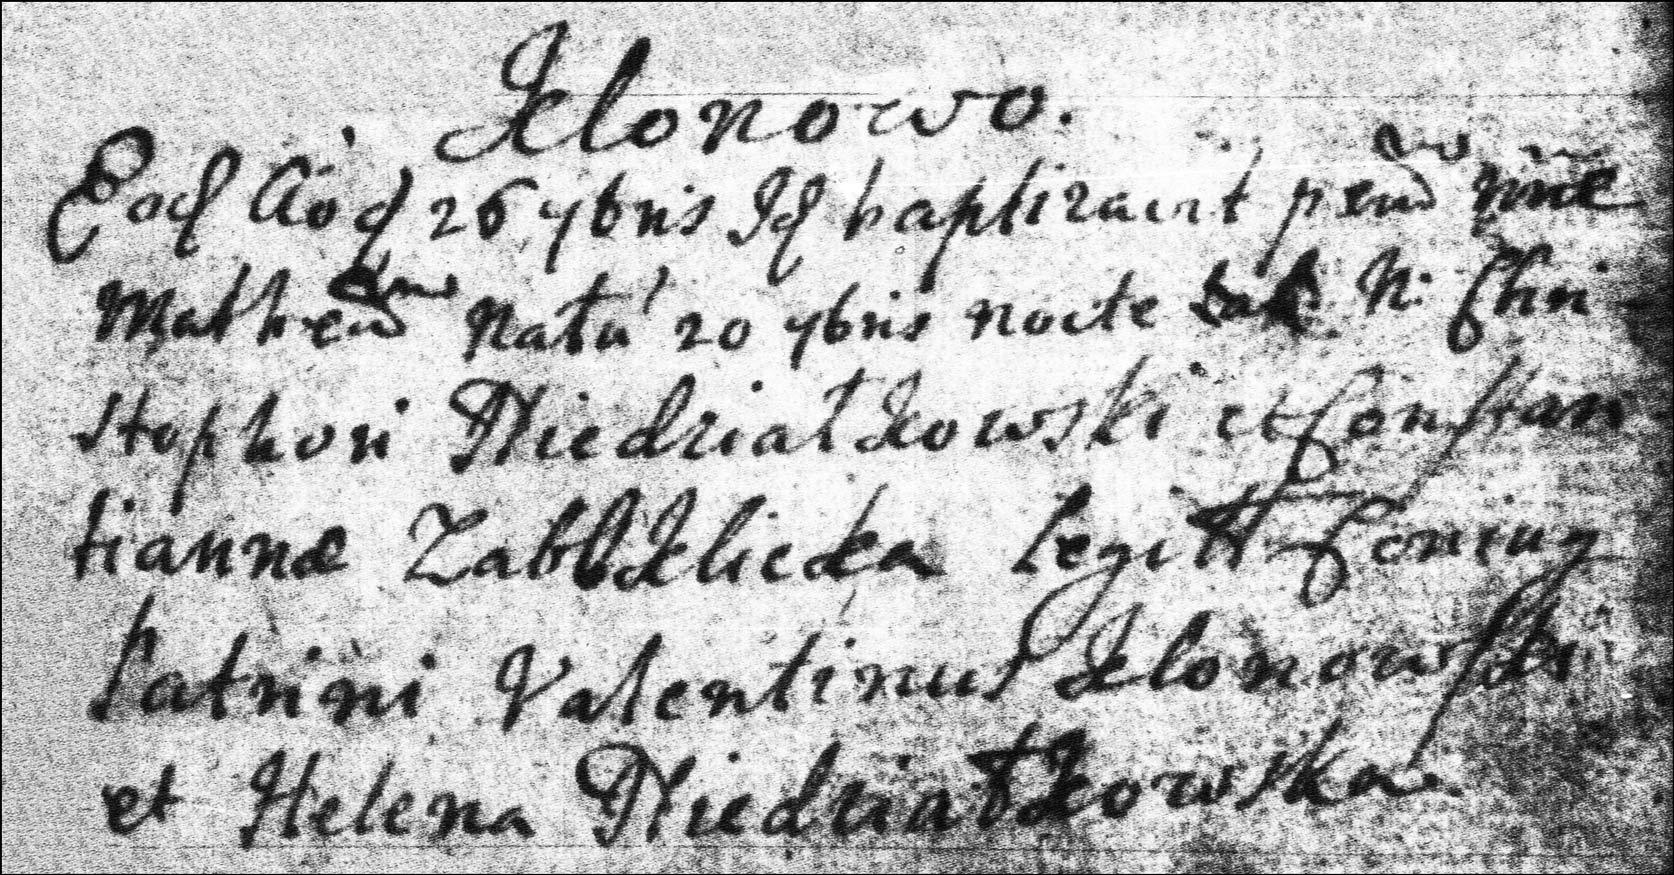 The Birth and Baptismal Record of Mateusz Niedzialkowski - 1723